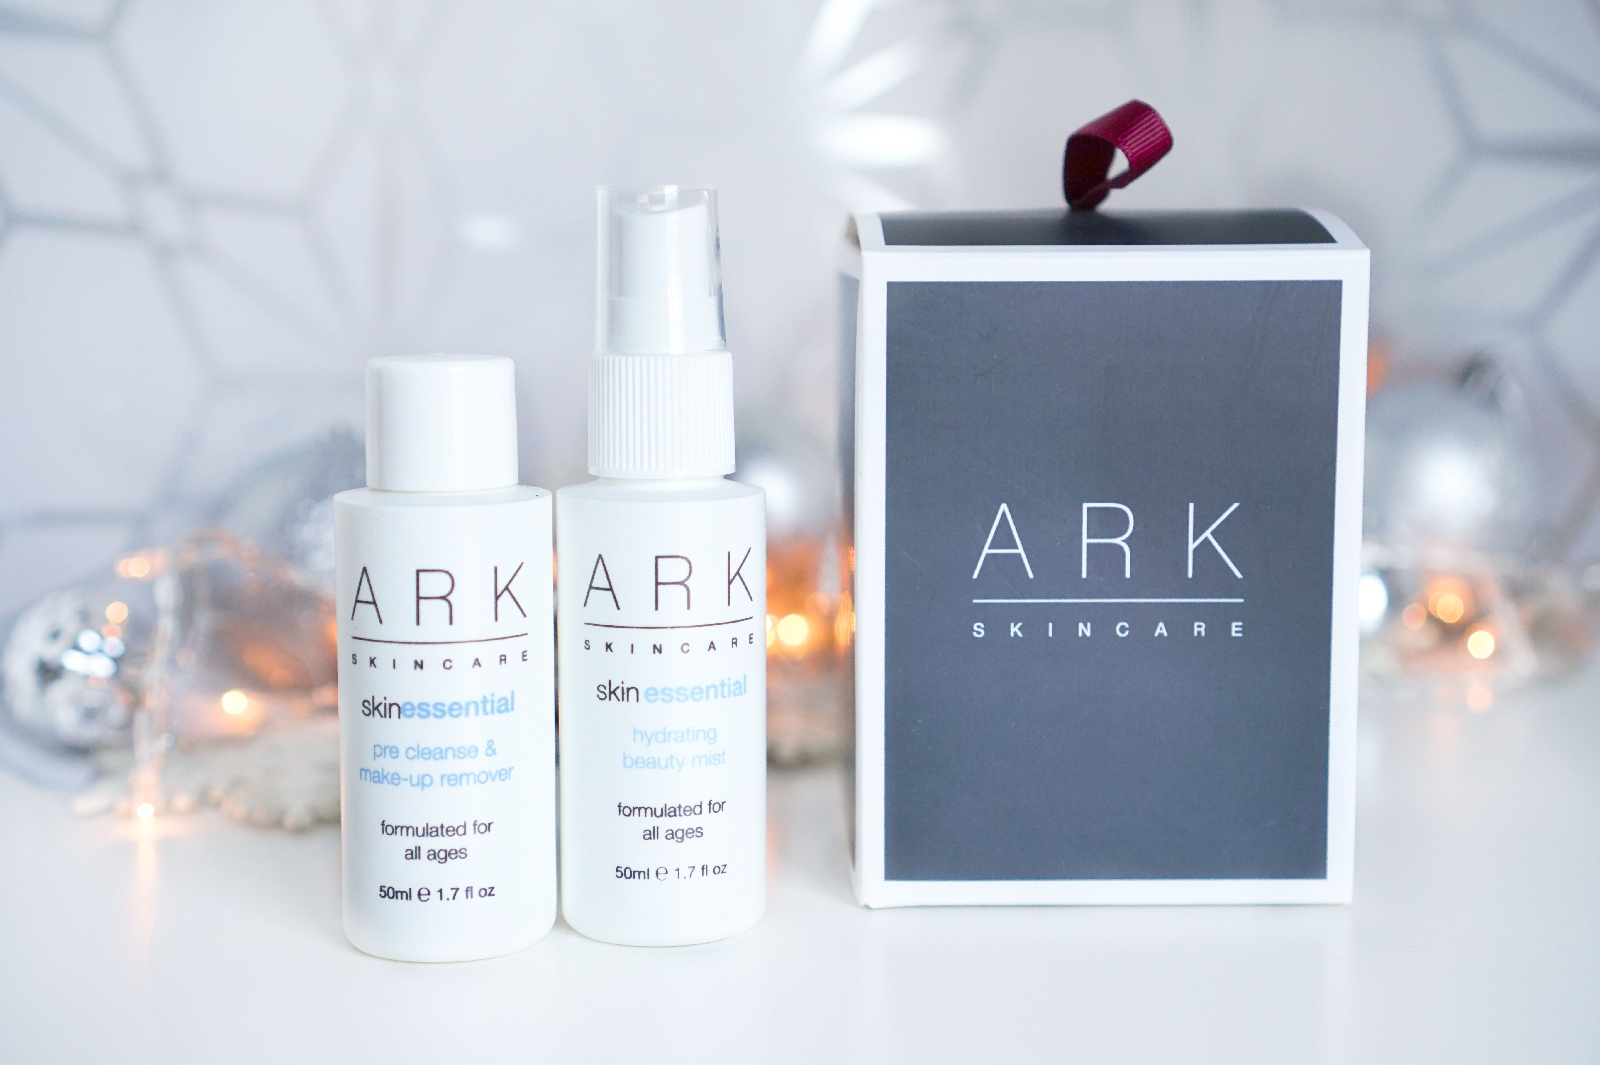 ARK Skincare Skin Essential Stocking Filler